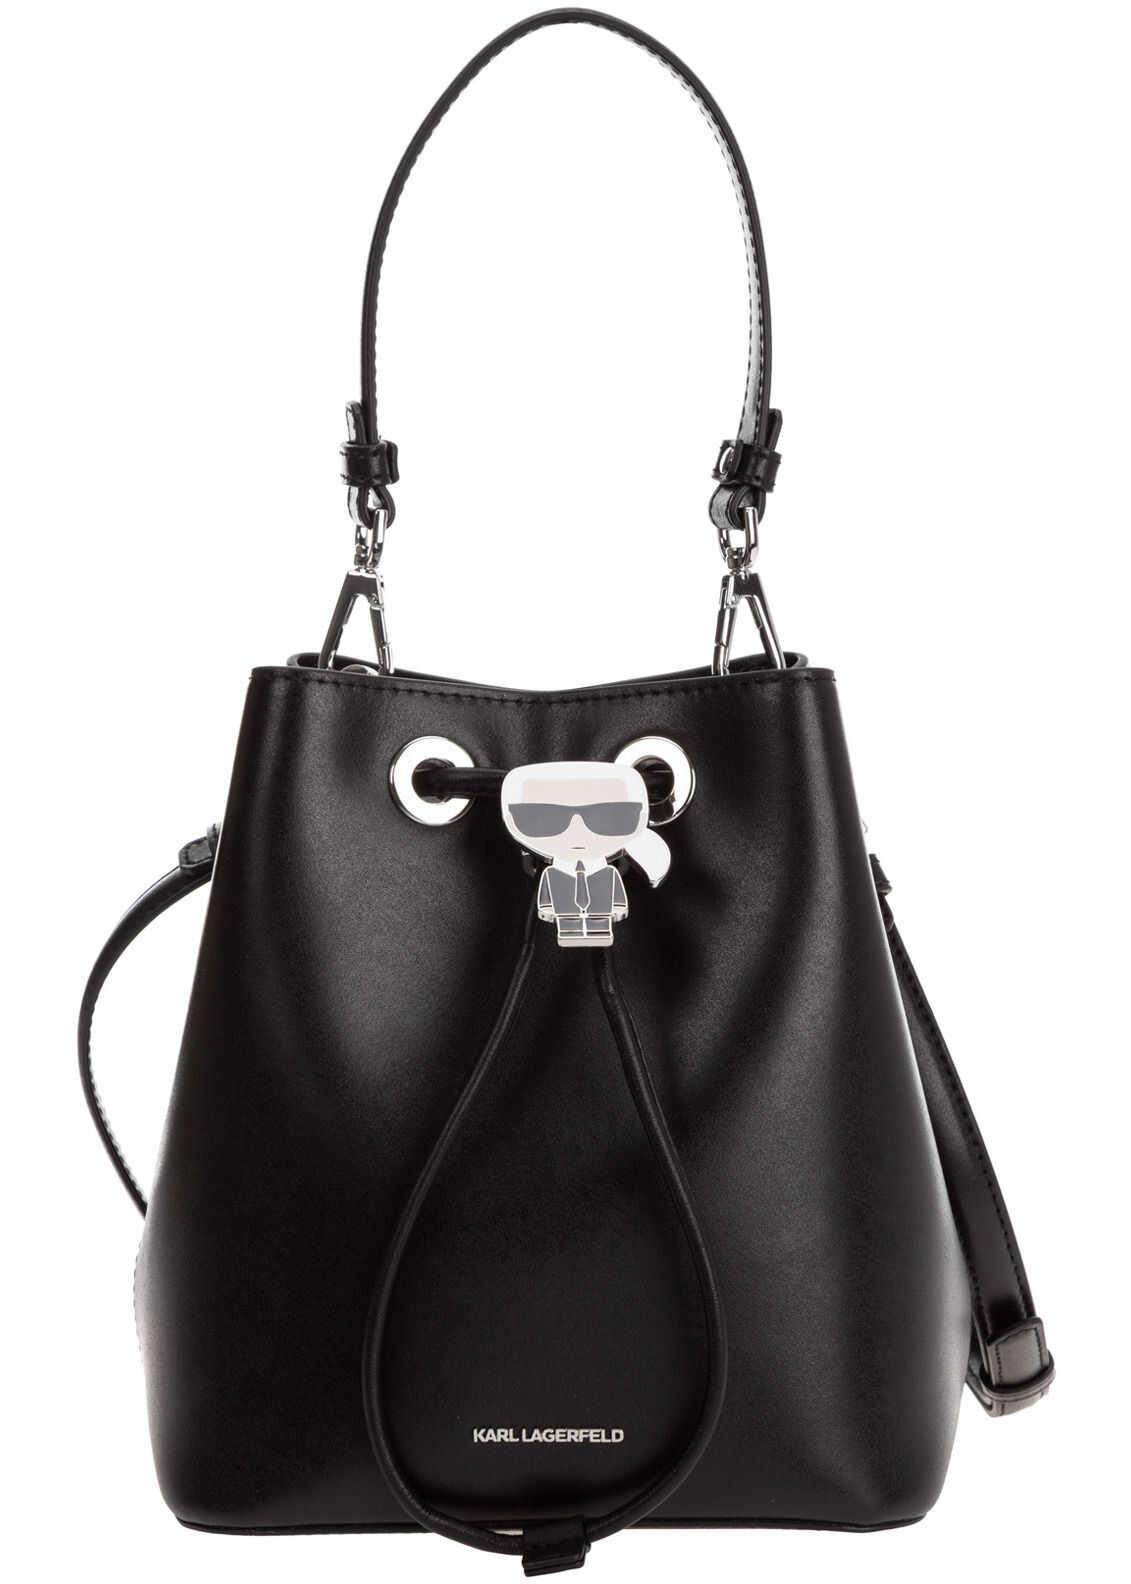 Karl Lagerfeld Leather Shoulder Bag K/Ikonik 205W3056.21 Black imagine b-mall.ro